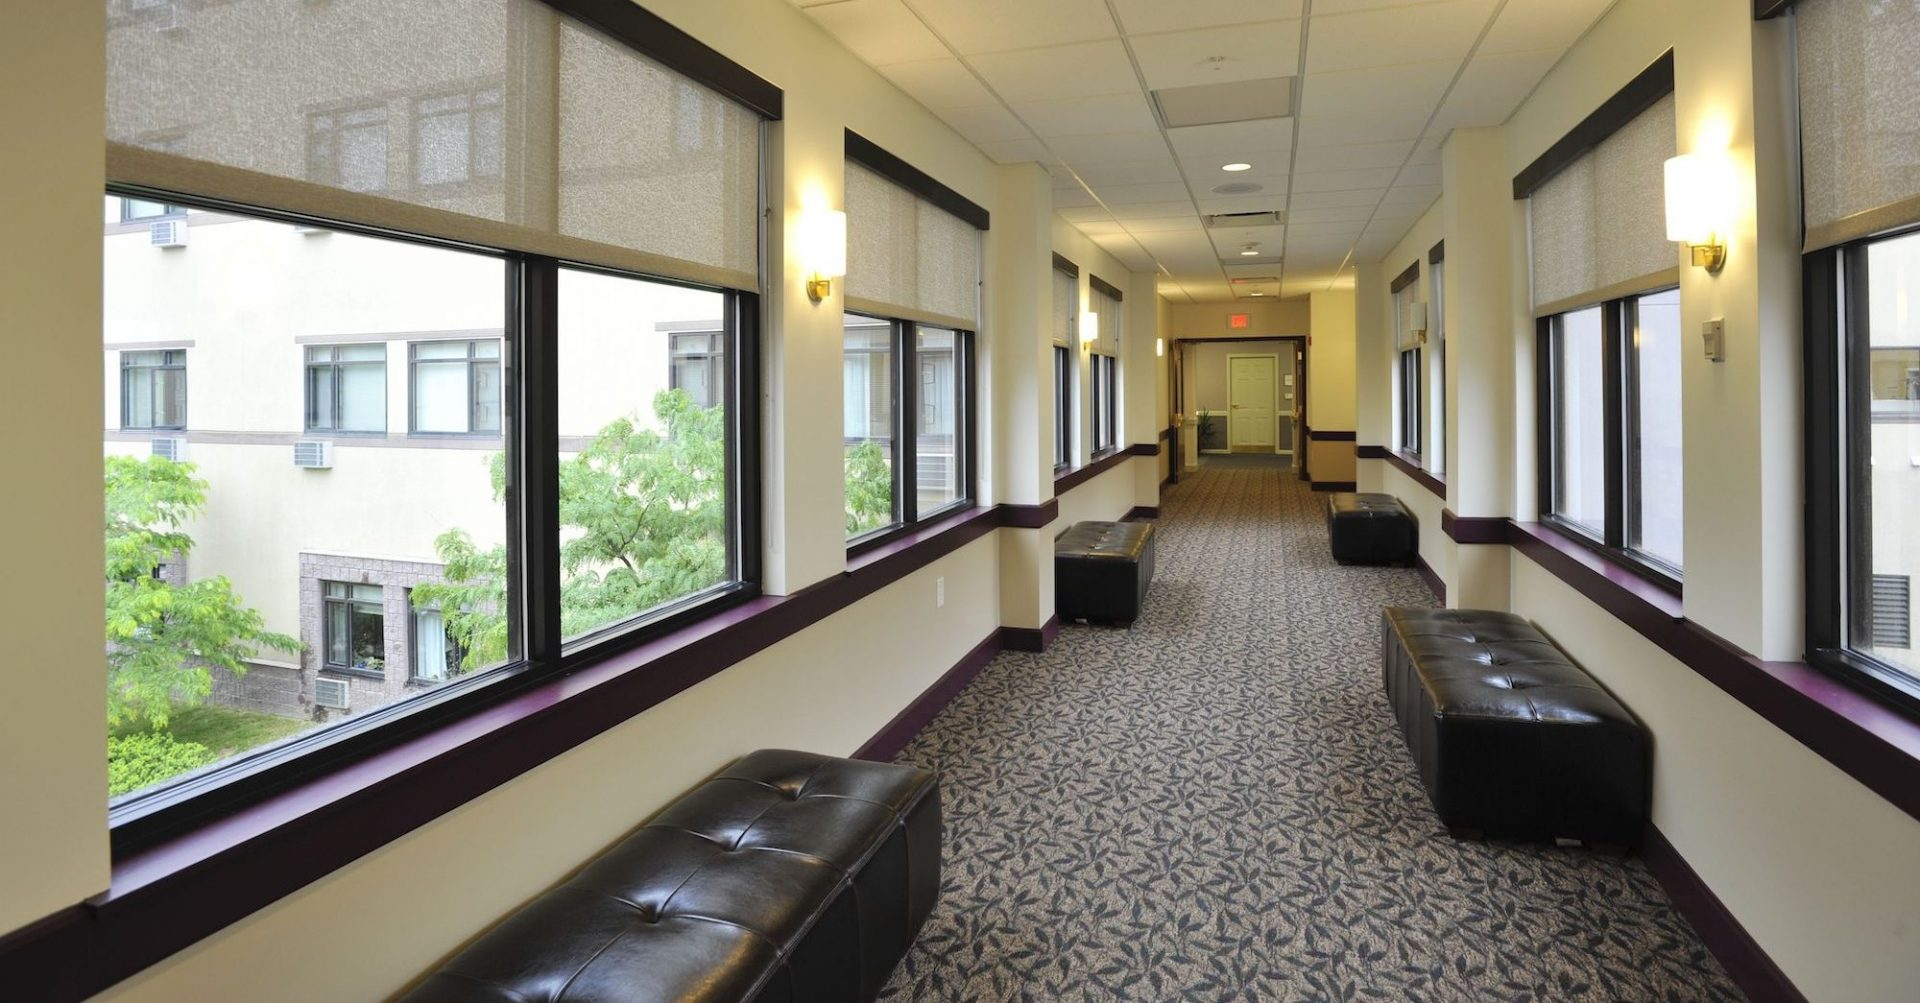 Eddy Memorial Geriatric Dining Room Hallway